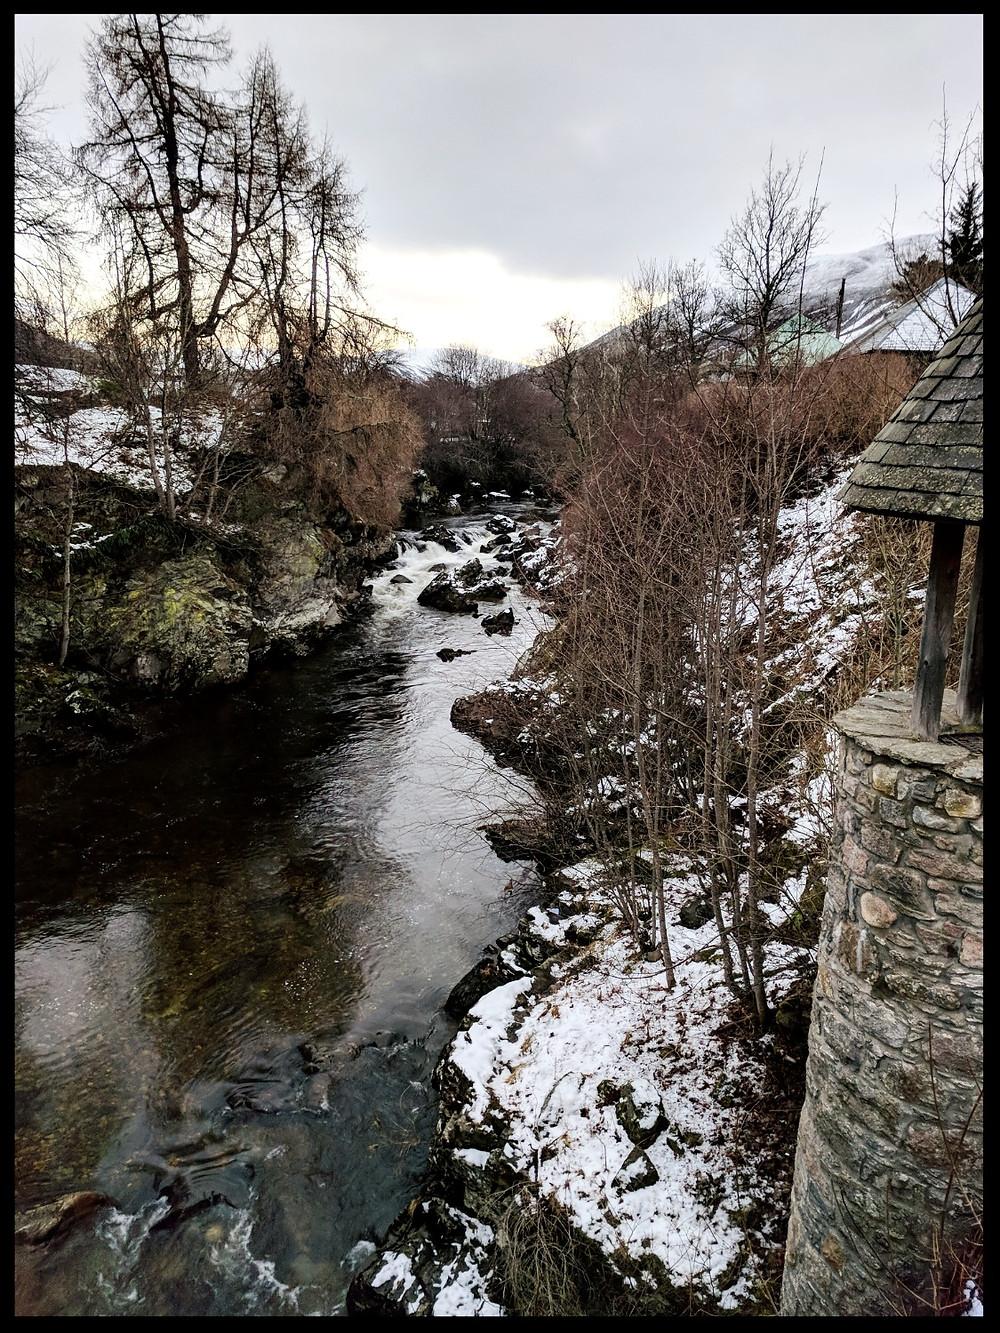 Braemar, Scotland